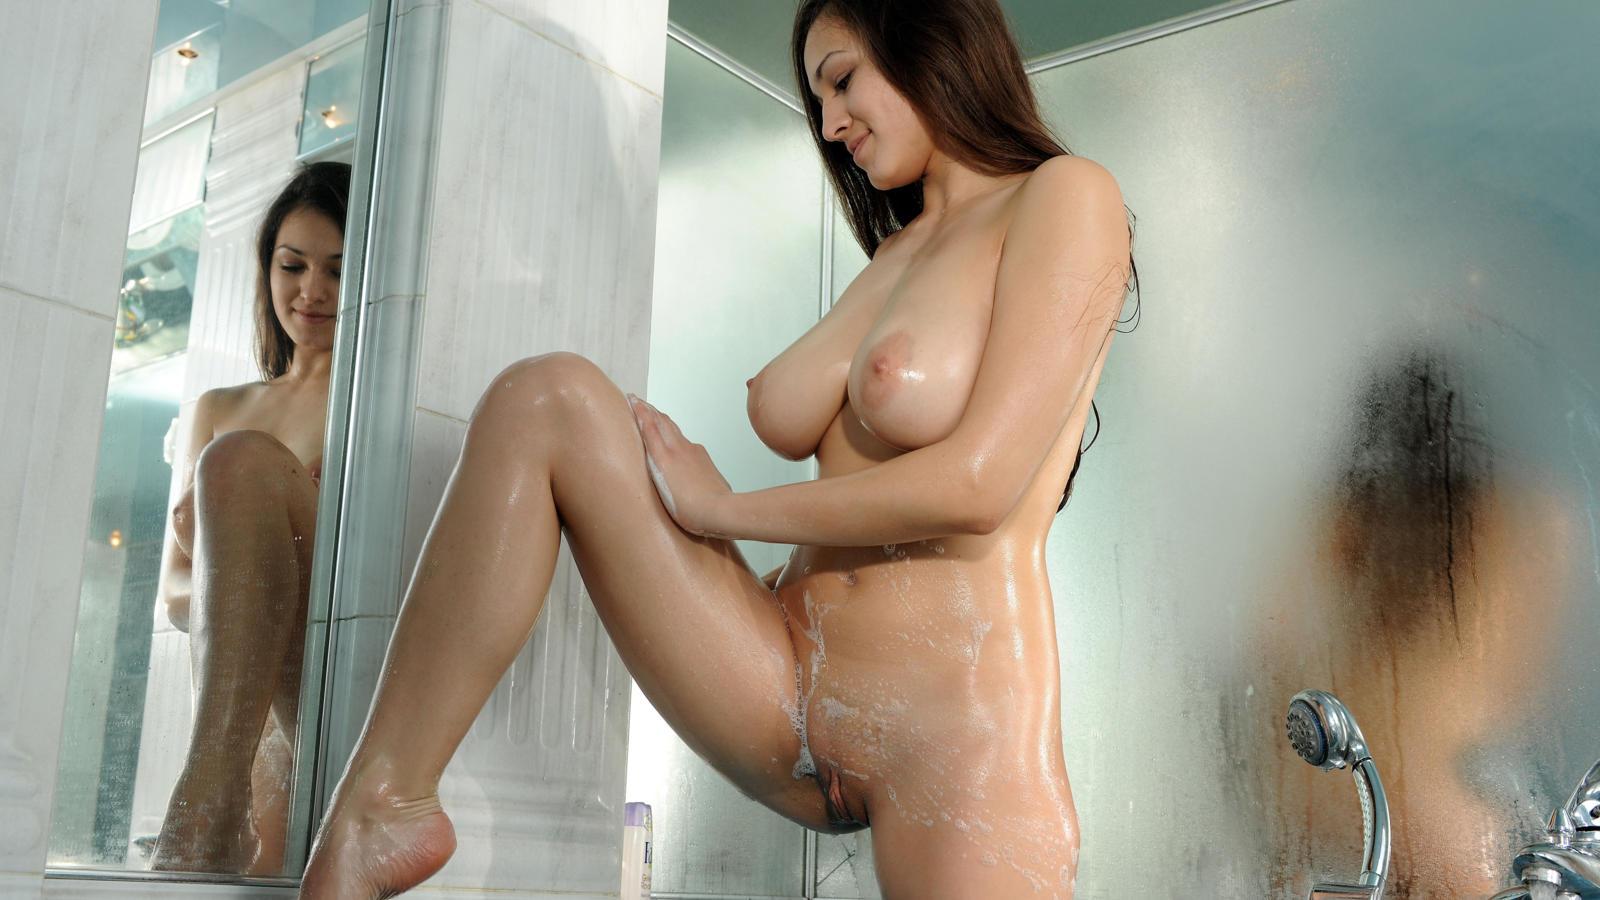 Nude shower room girls